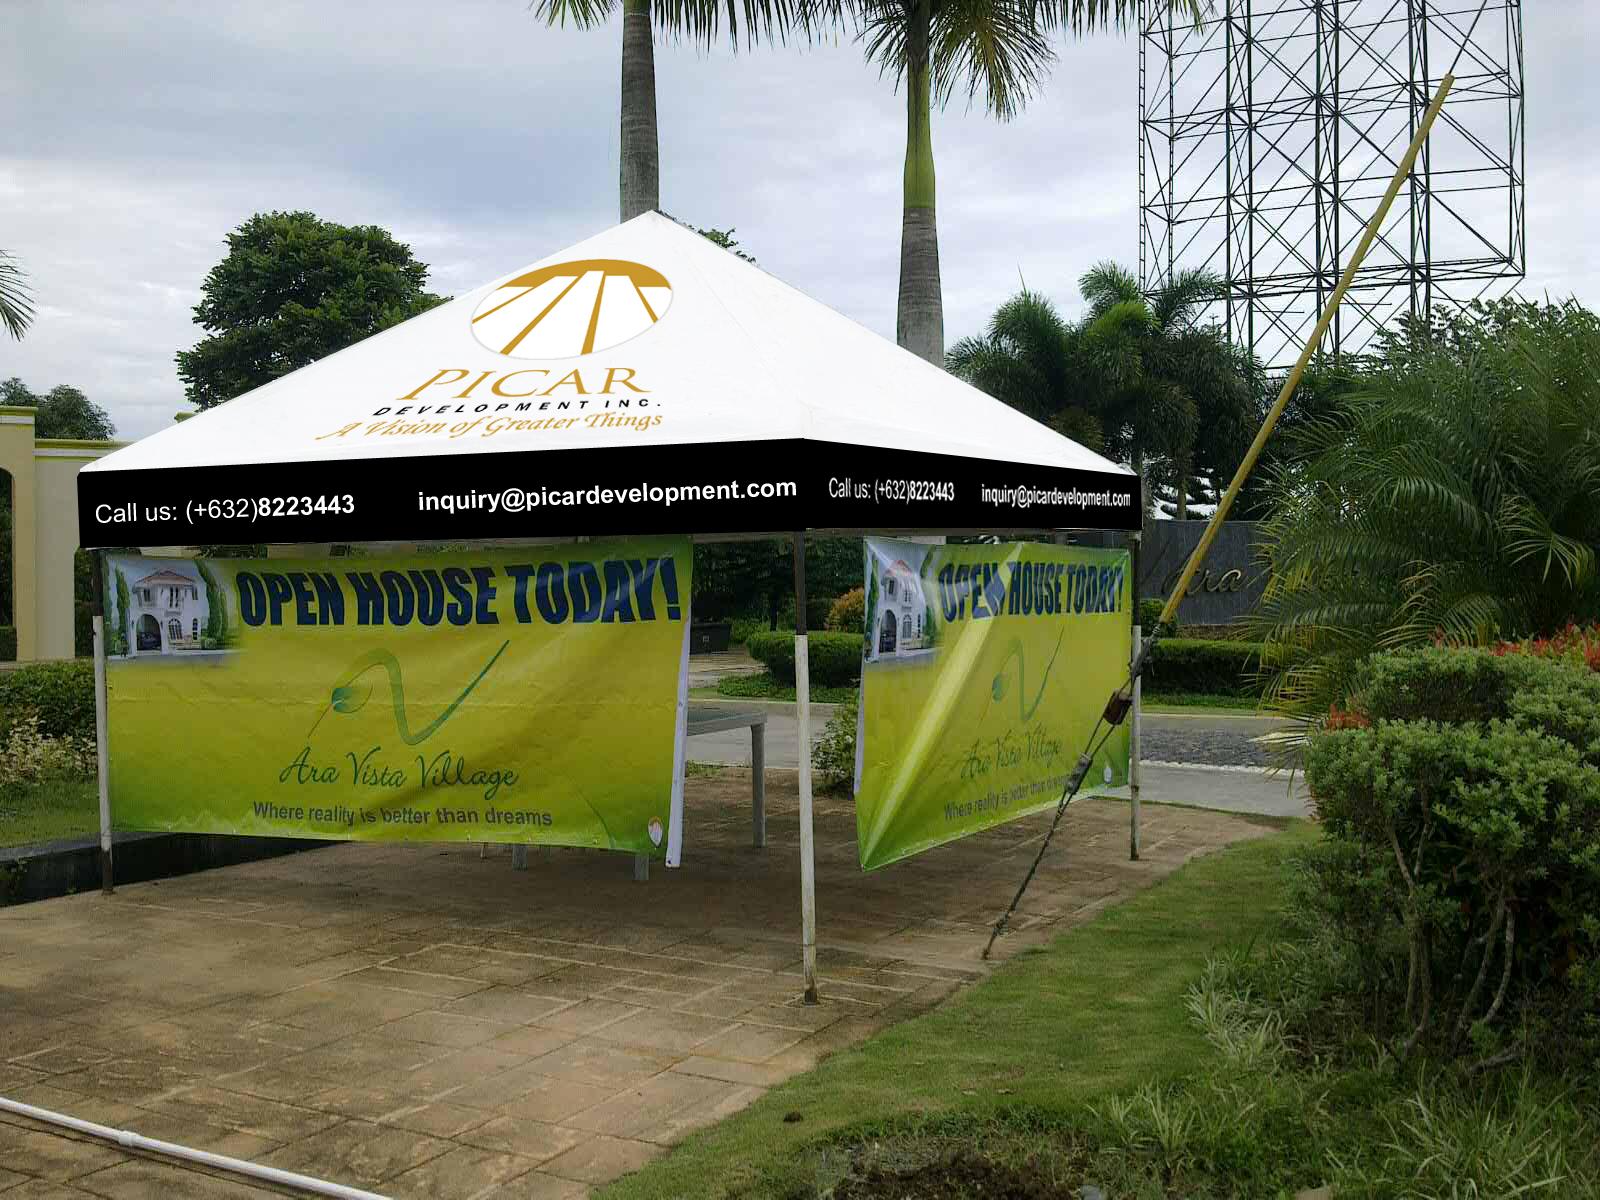 Garage Tent Cover Front & Tents u2013 Fabrimetrics Philippines Inc.